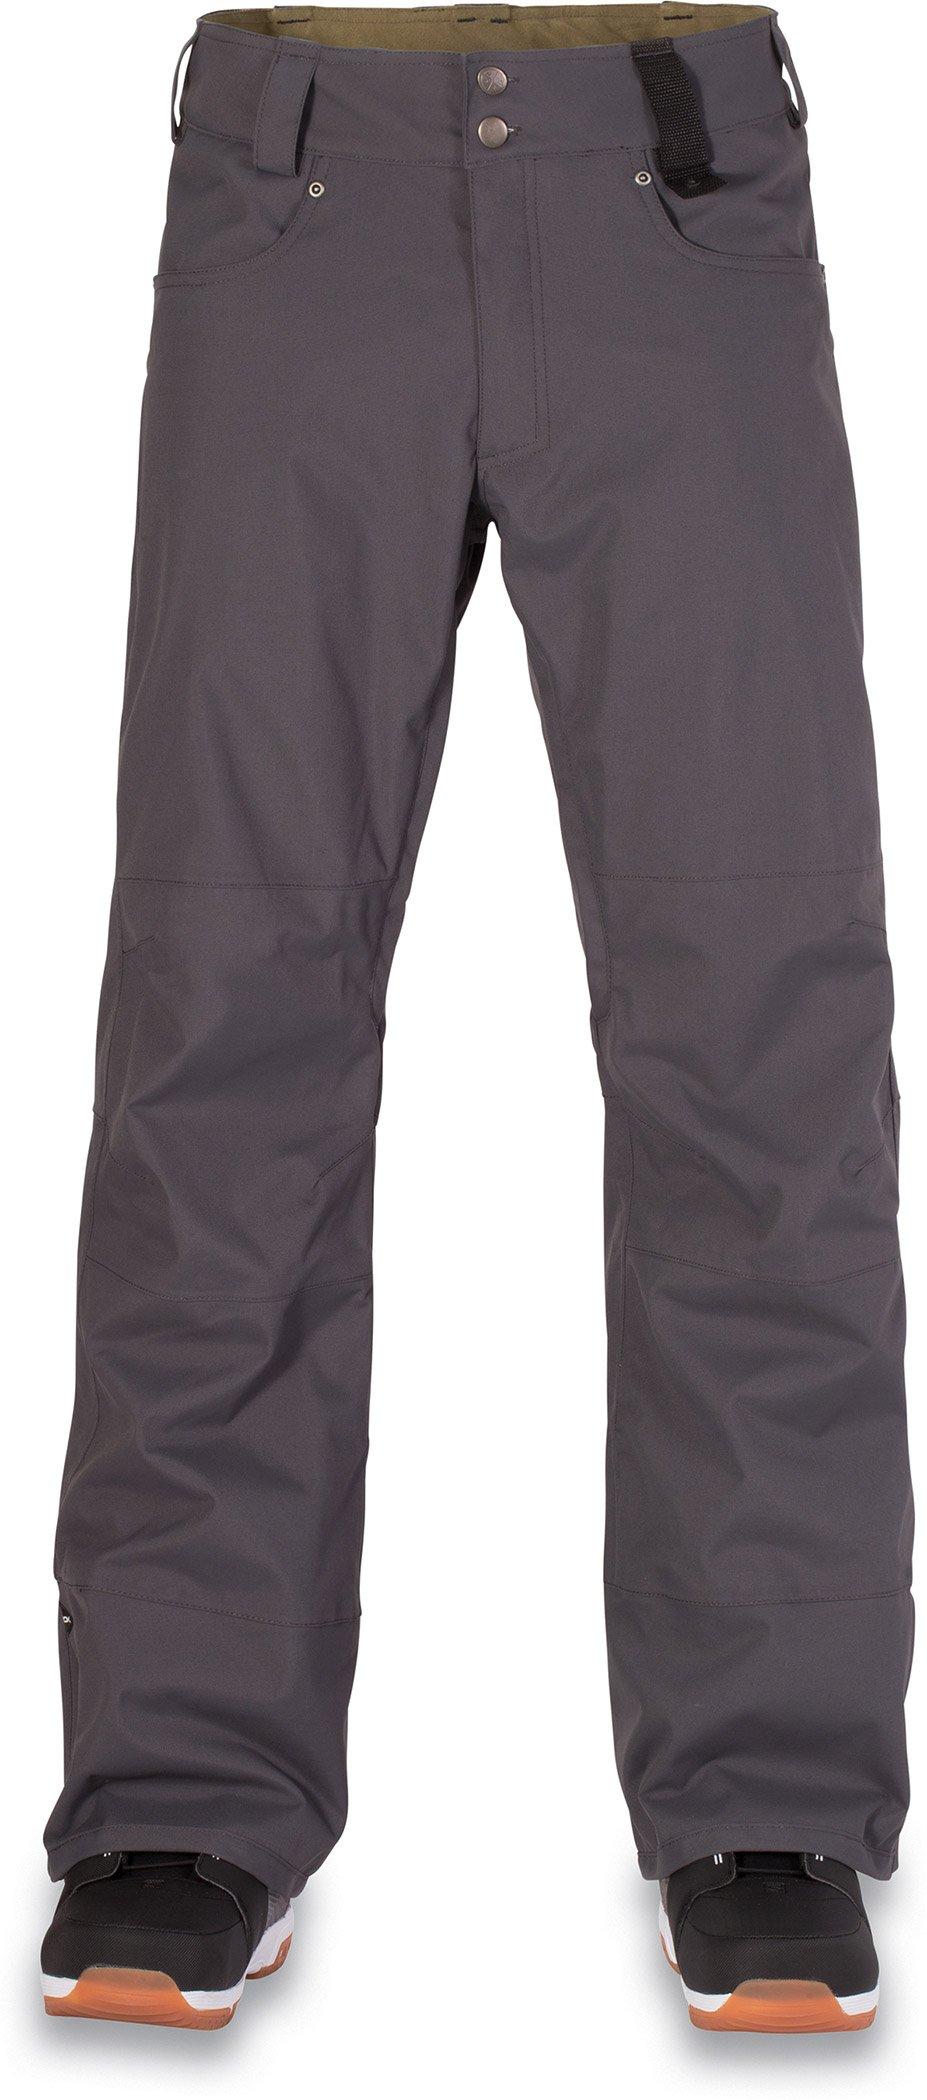 Dakine Men's Artillery Insulated Pants, Shadow, L